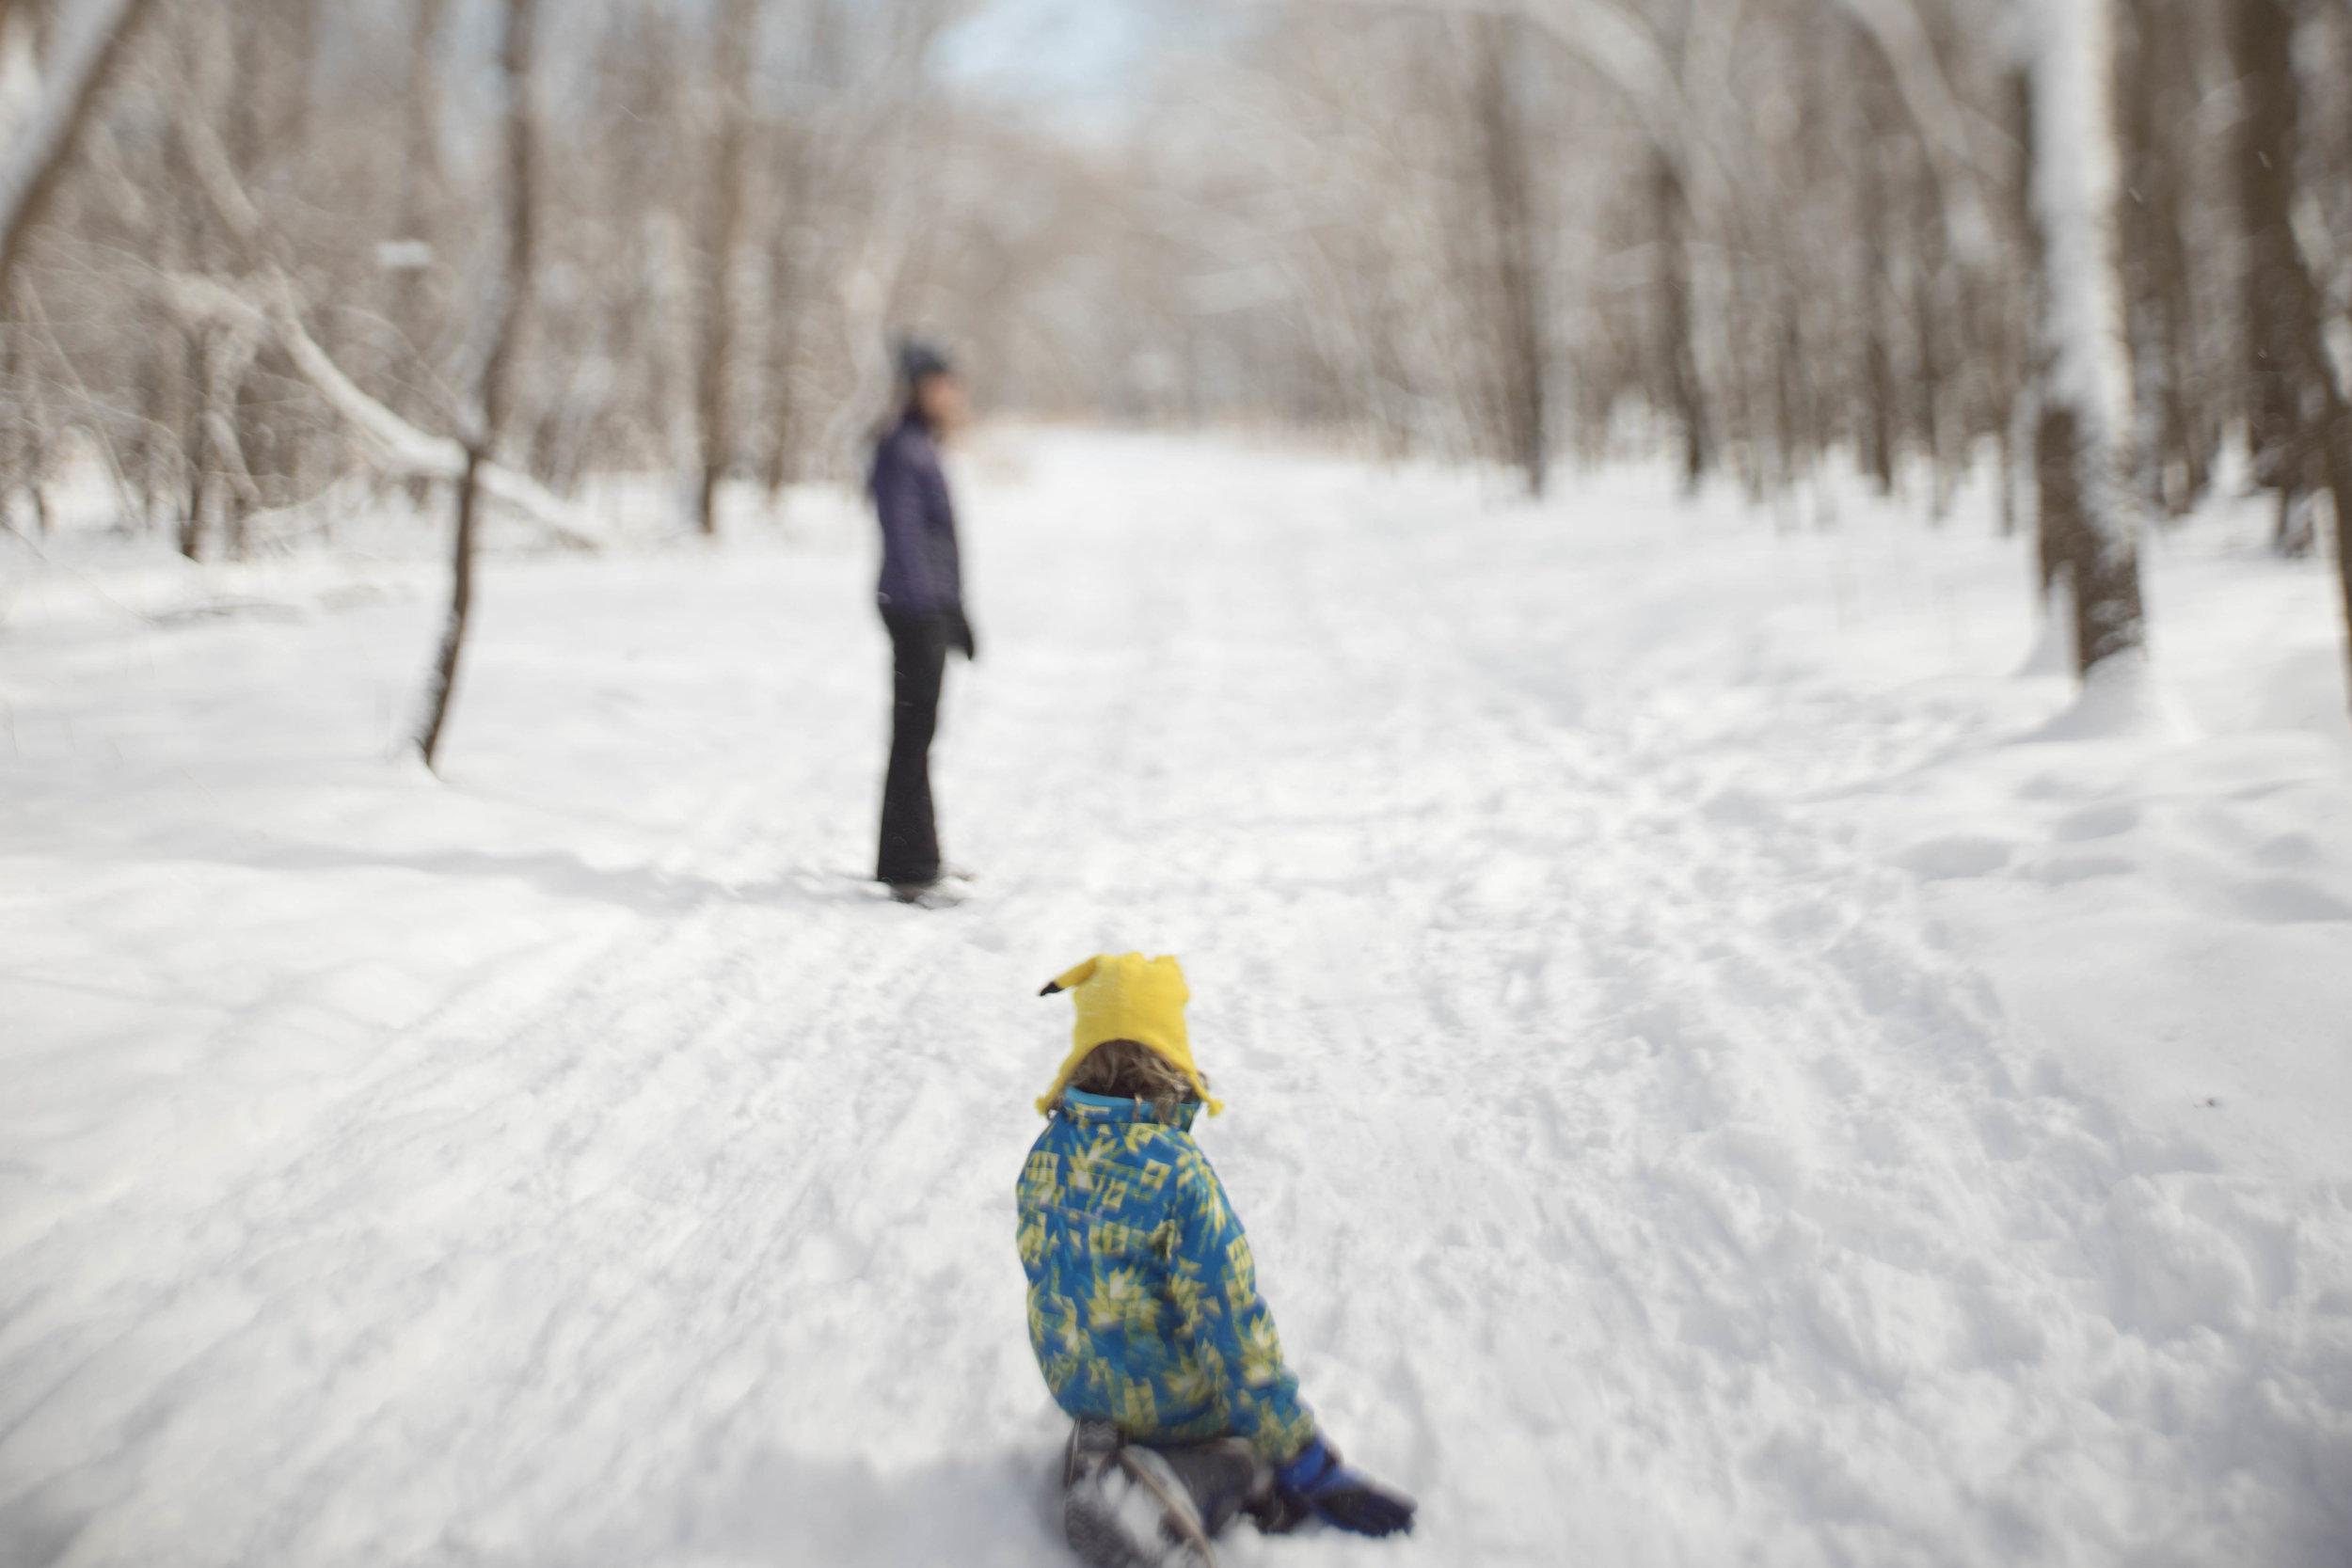 freelensed-winter-hiking-boy-lincoln